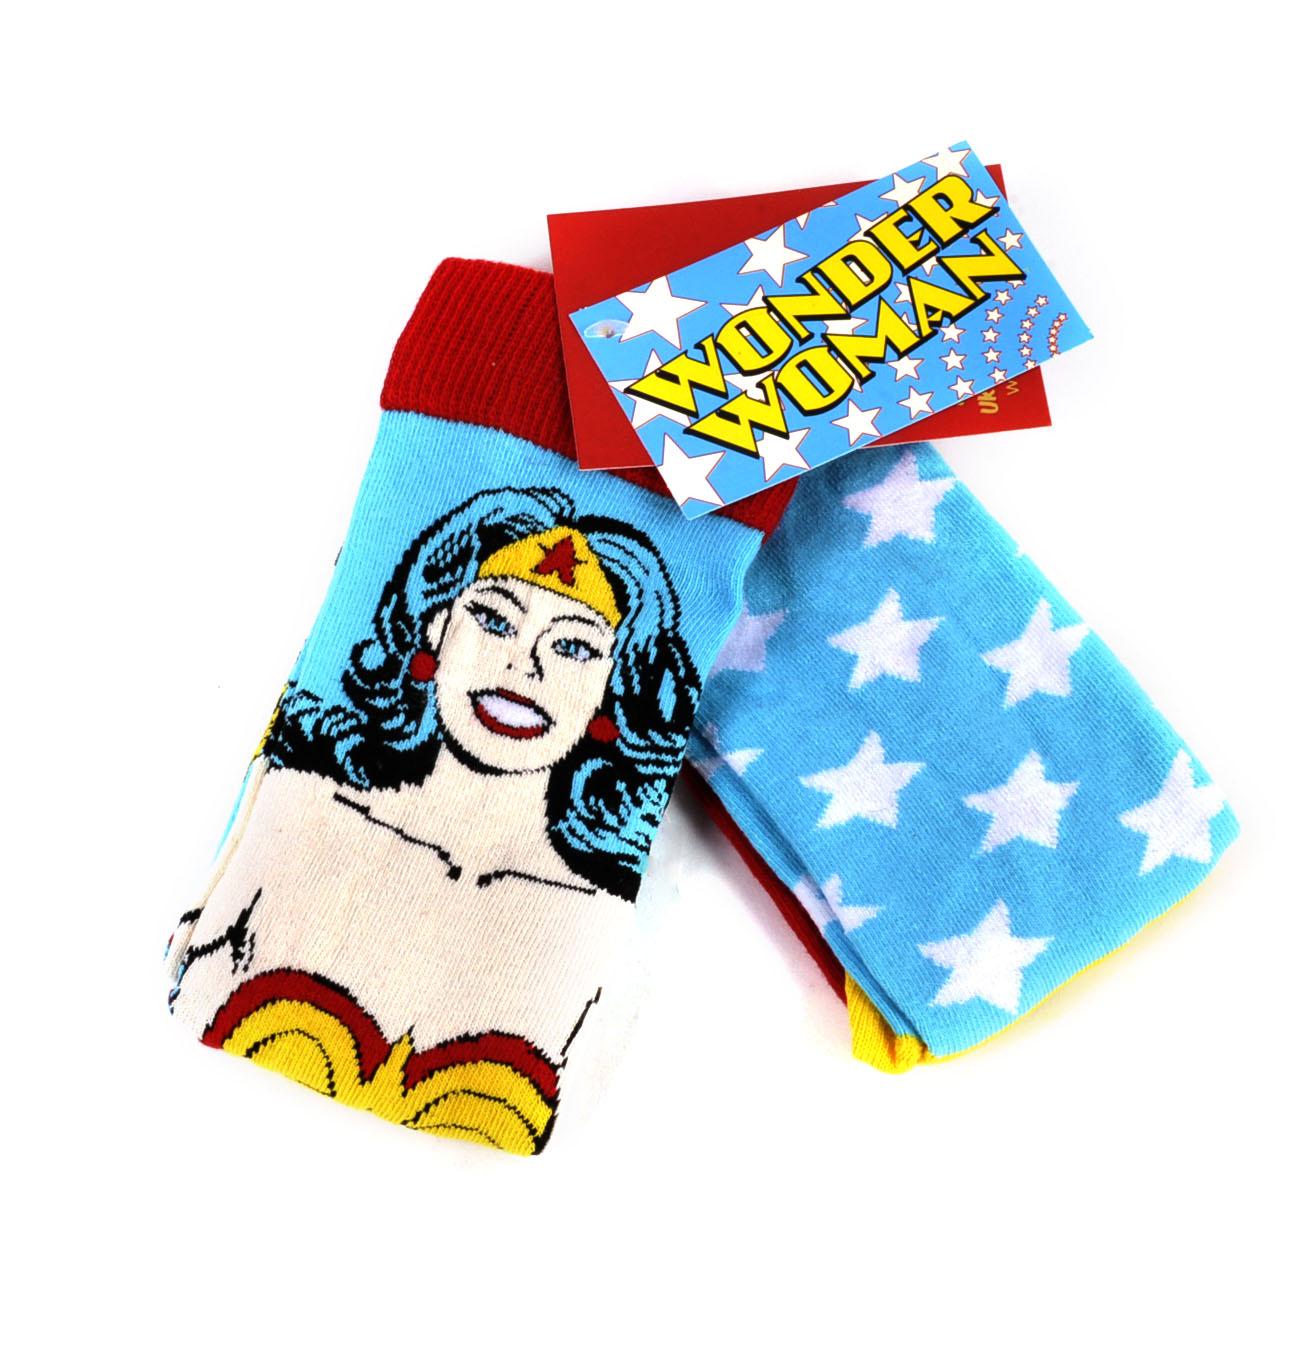 DC COMICS 2 PACK WONDER WOMAN STAR LOGO ALL OVER PRINT MENS CREW SOCKS RETRO NWT